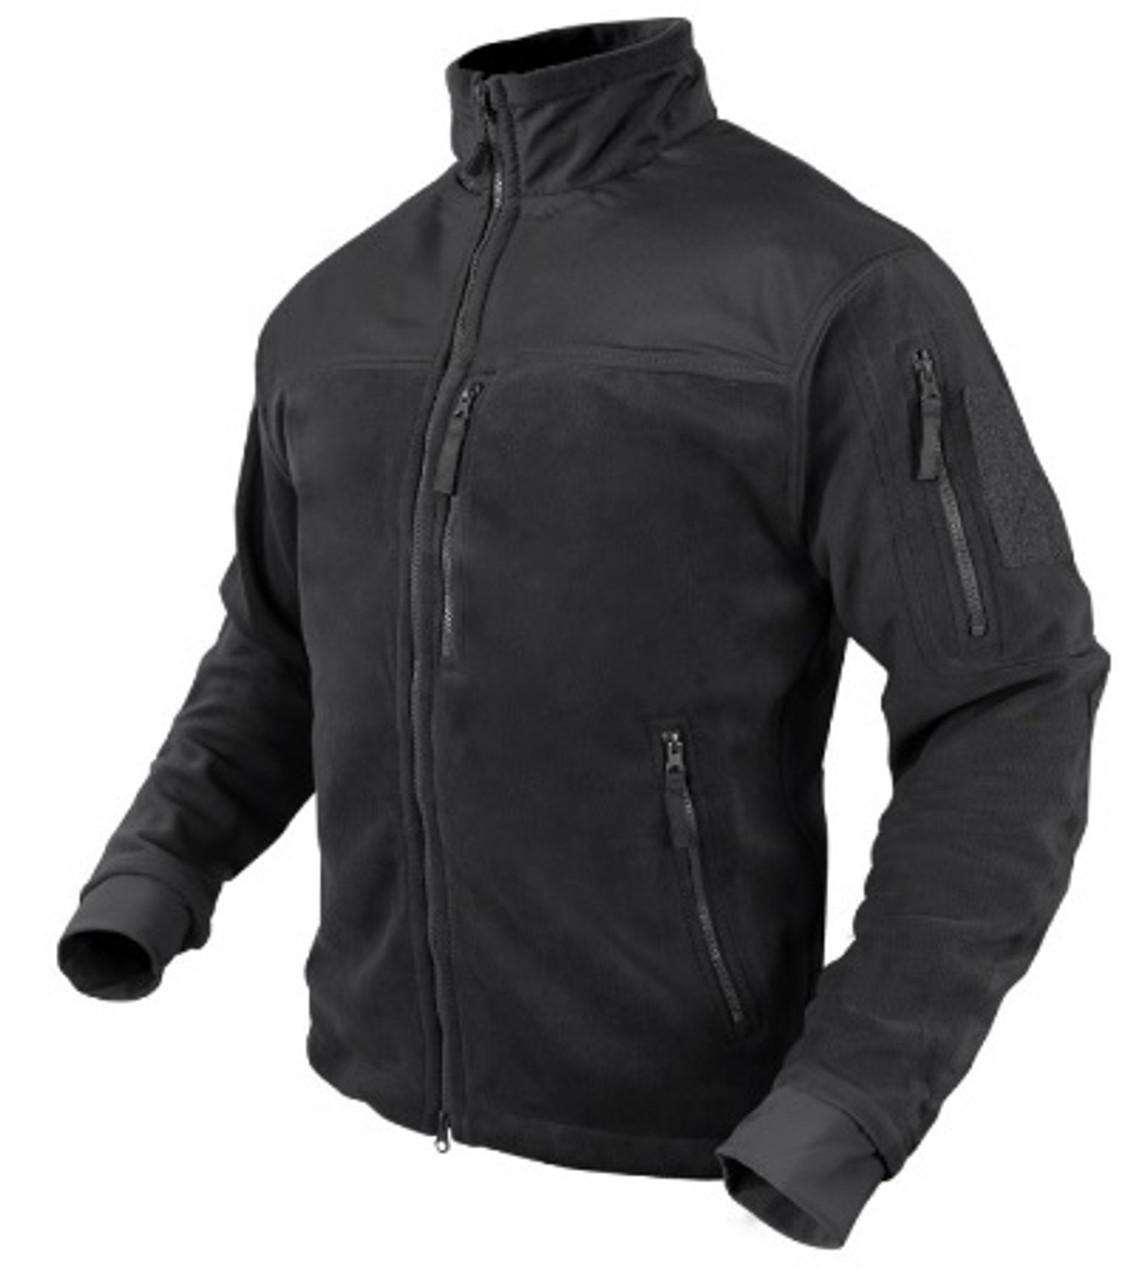 Condor Alpha Fleece Jacket, 3 Colors Available